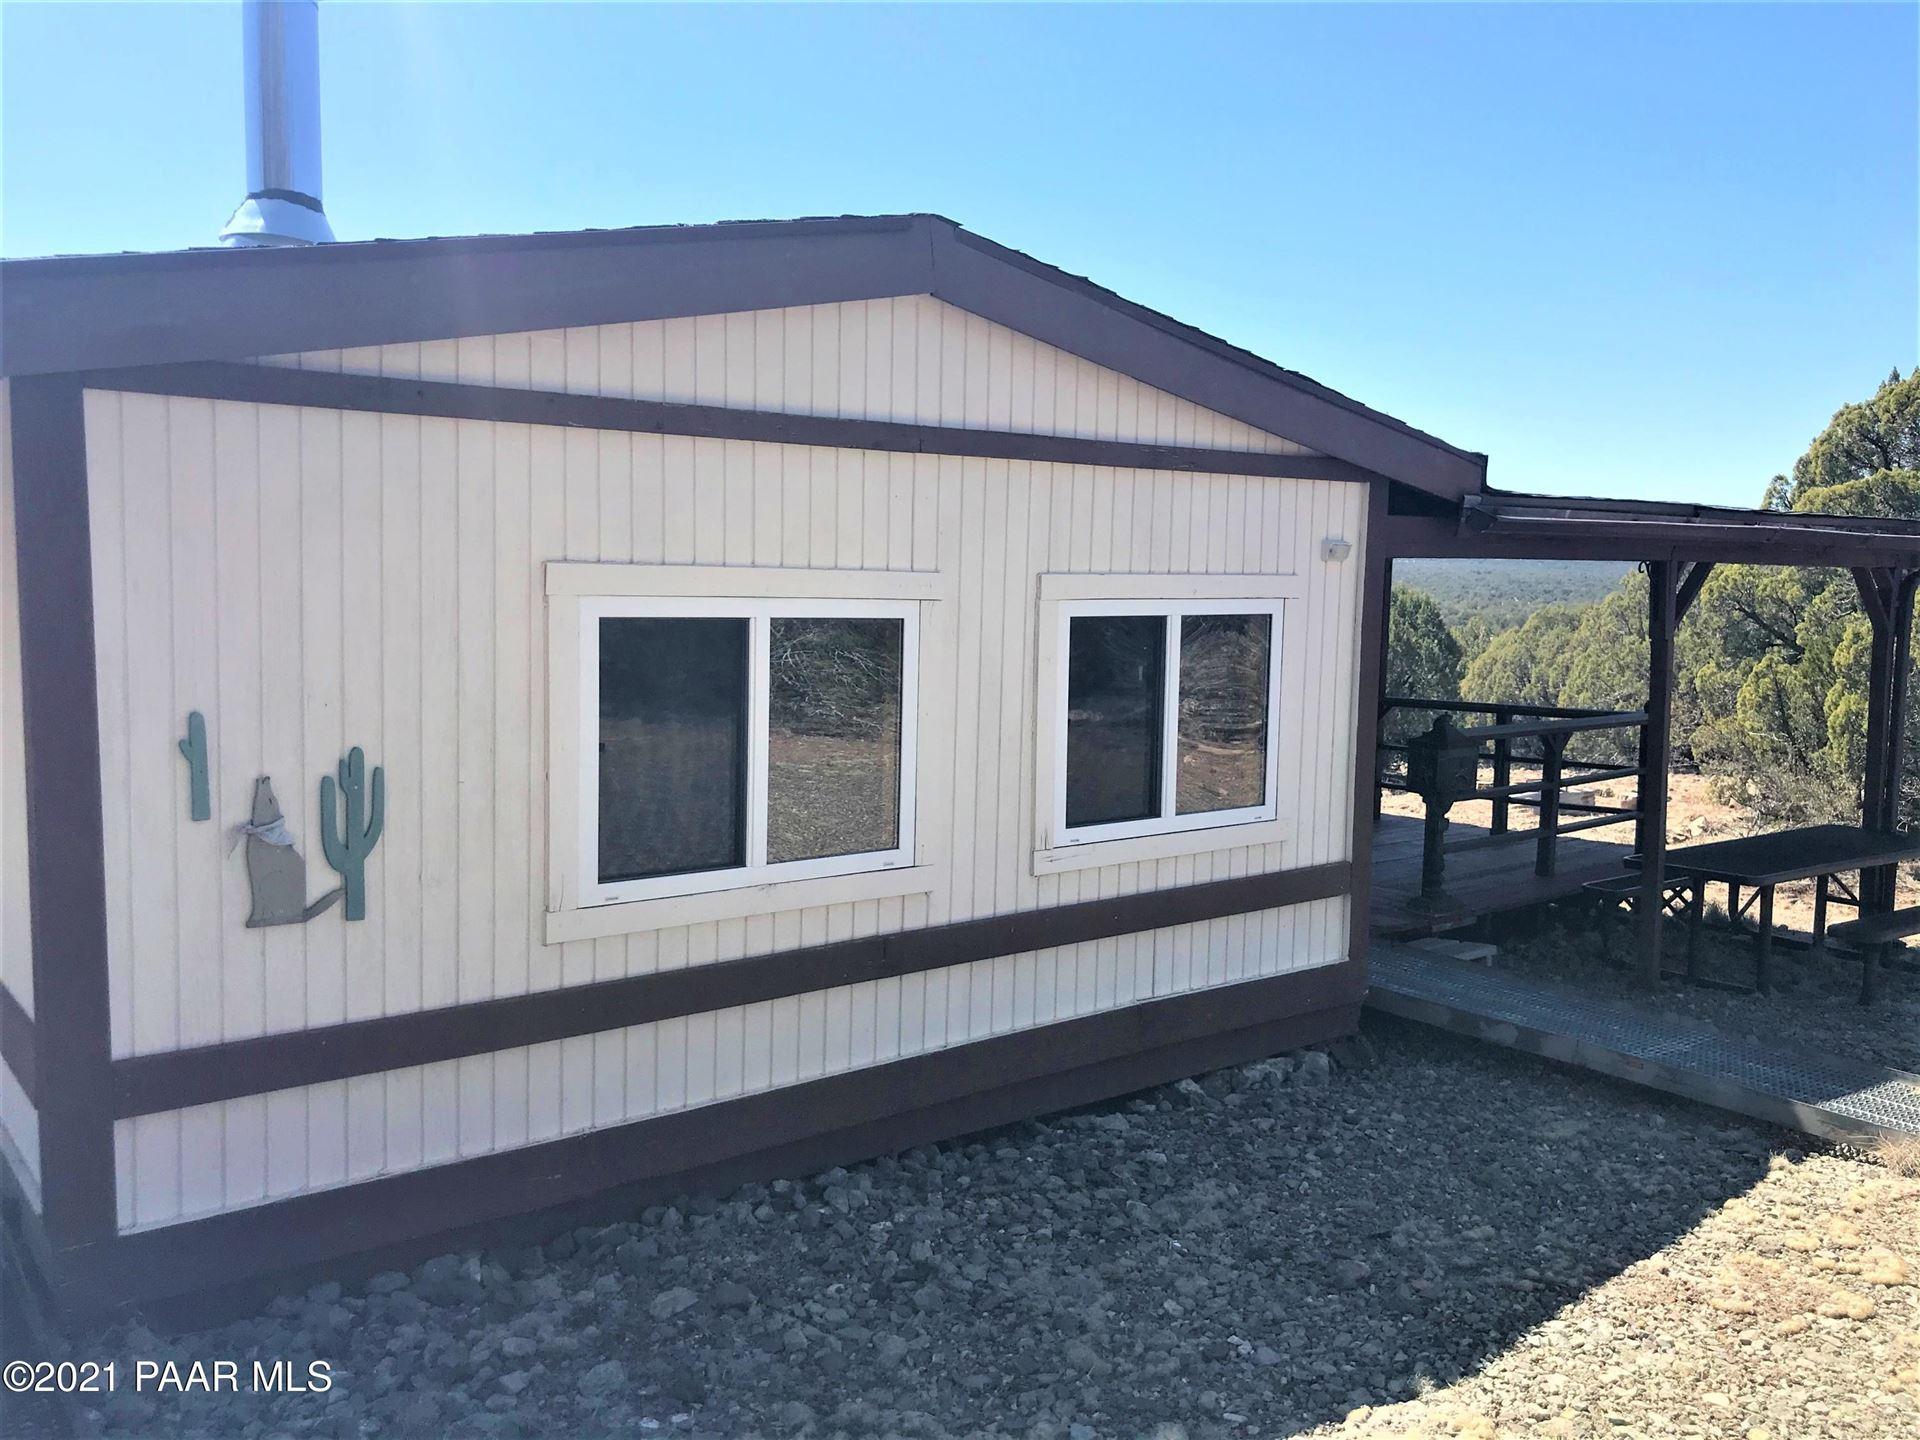 Photo of 299 N Chippendale Trail #Lot: 299, Seligman, AZ 86337 (MLS # 1037667)